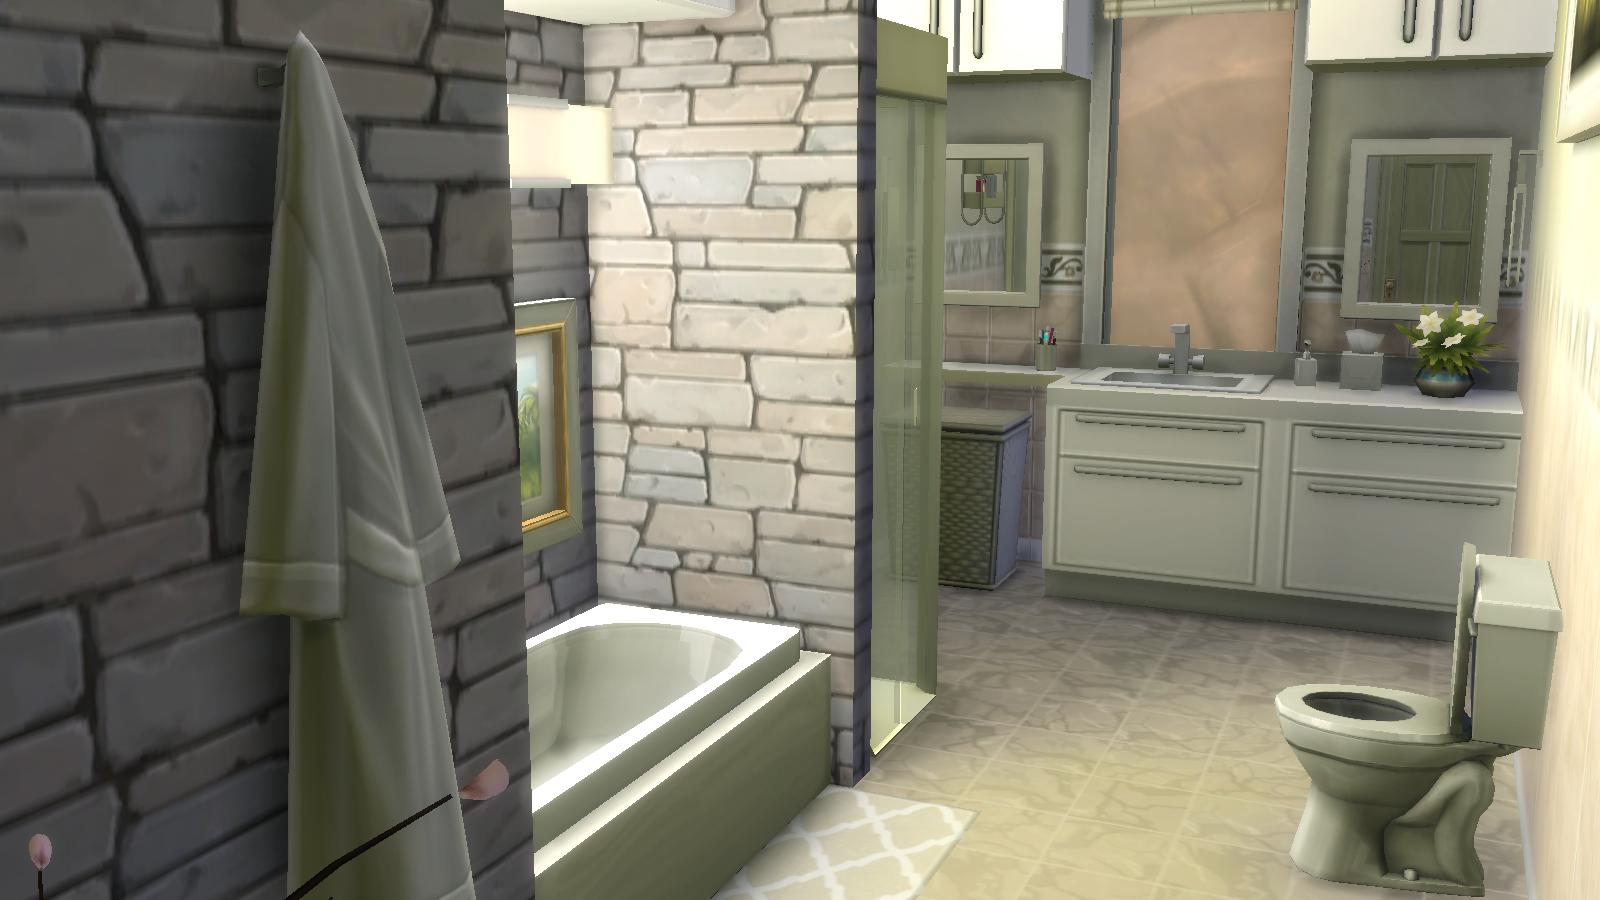 Haus Dekorieren Sims 4